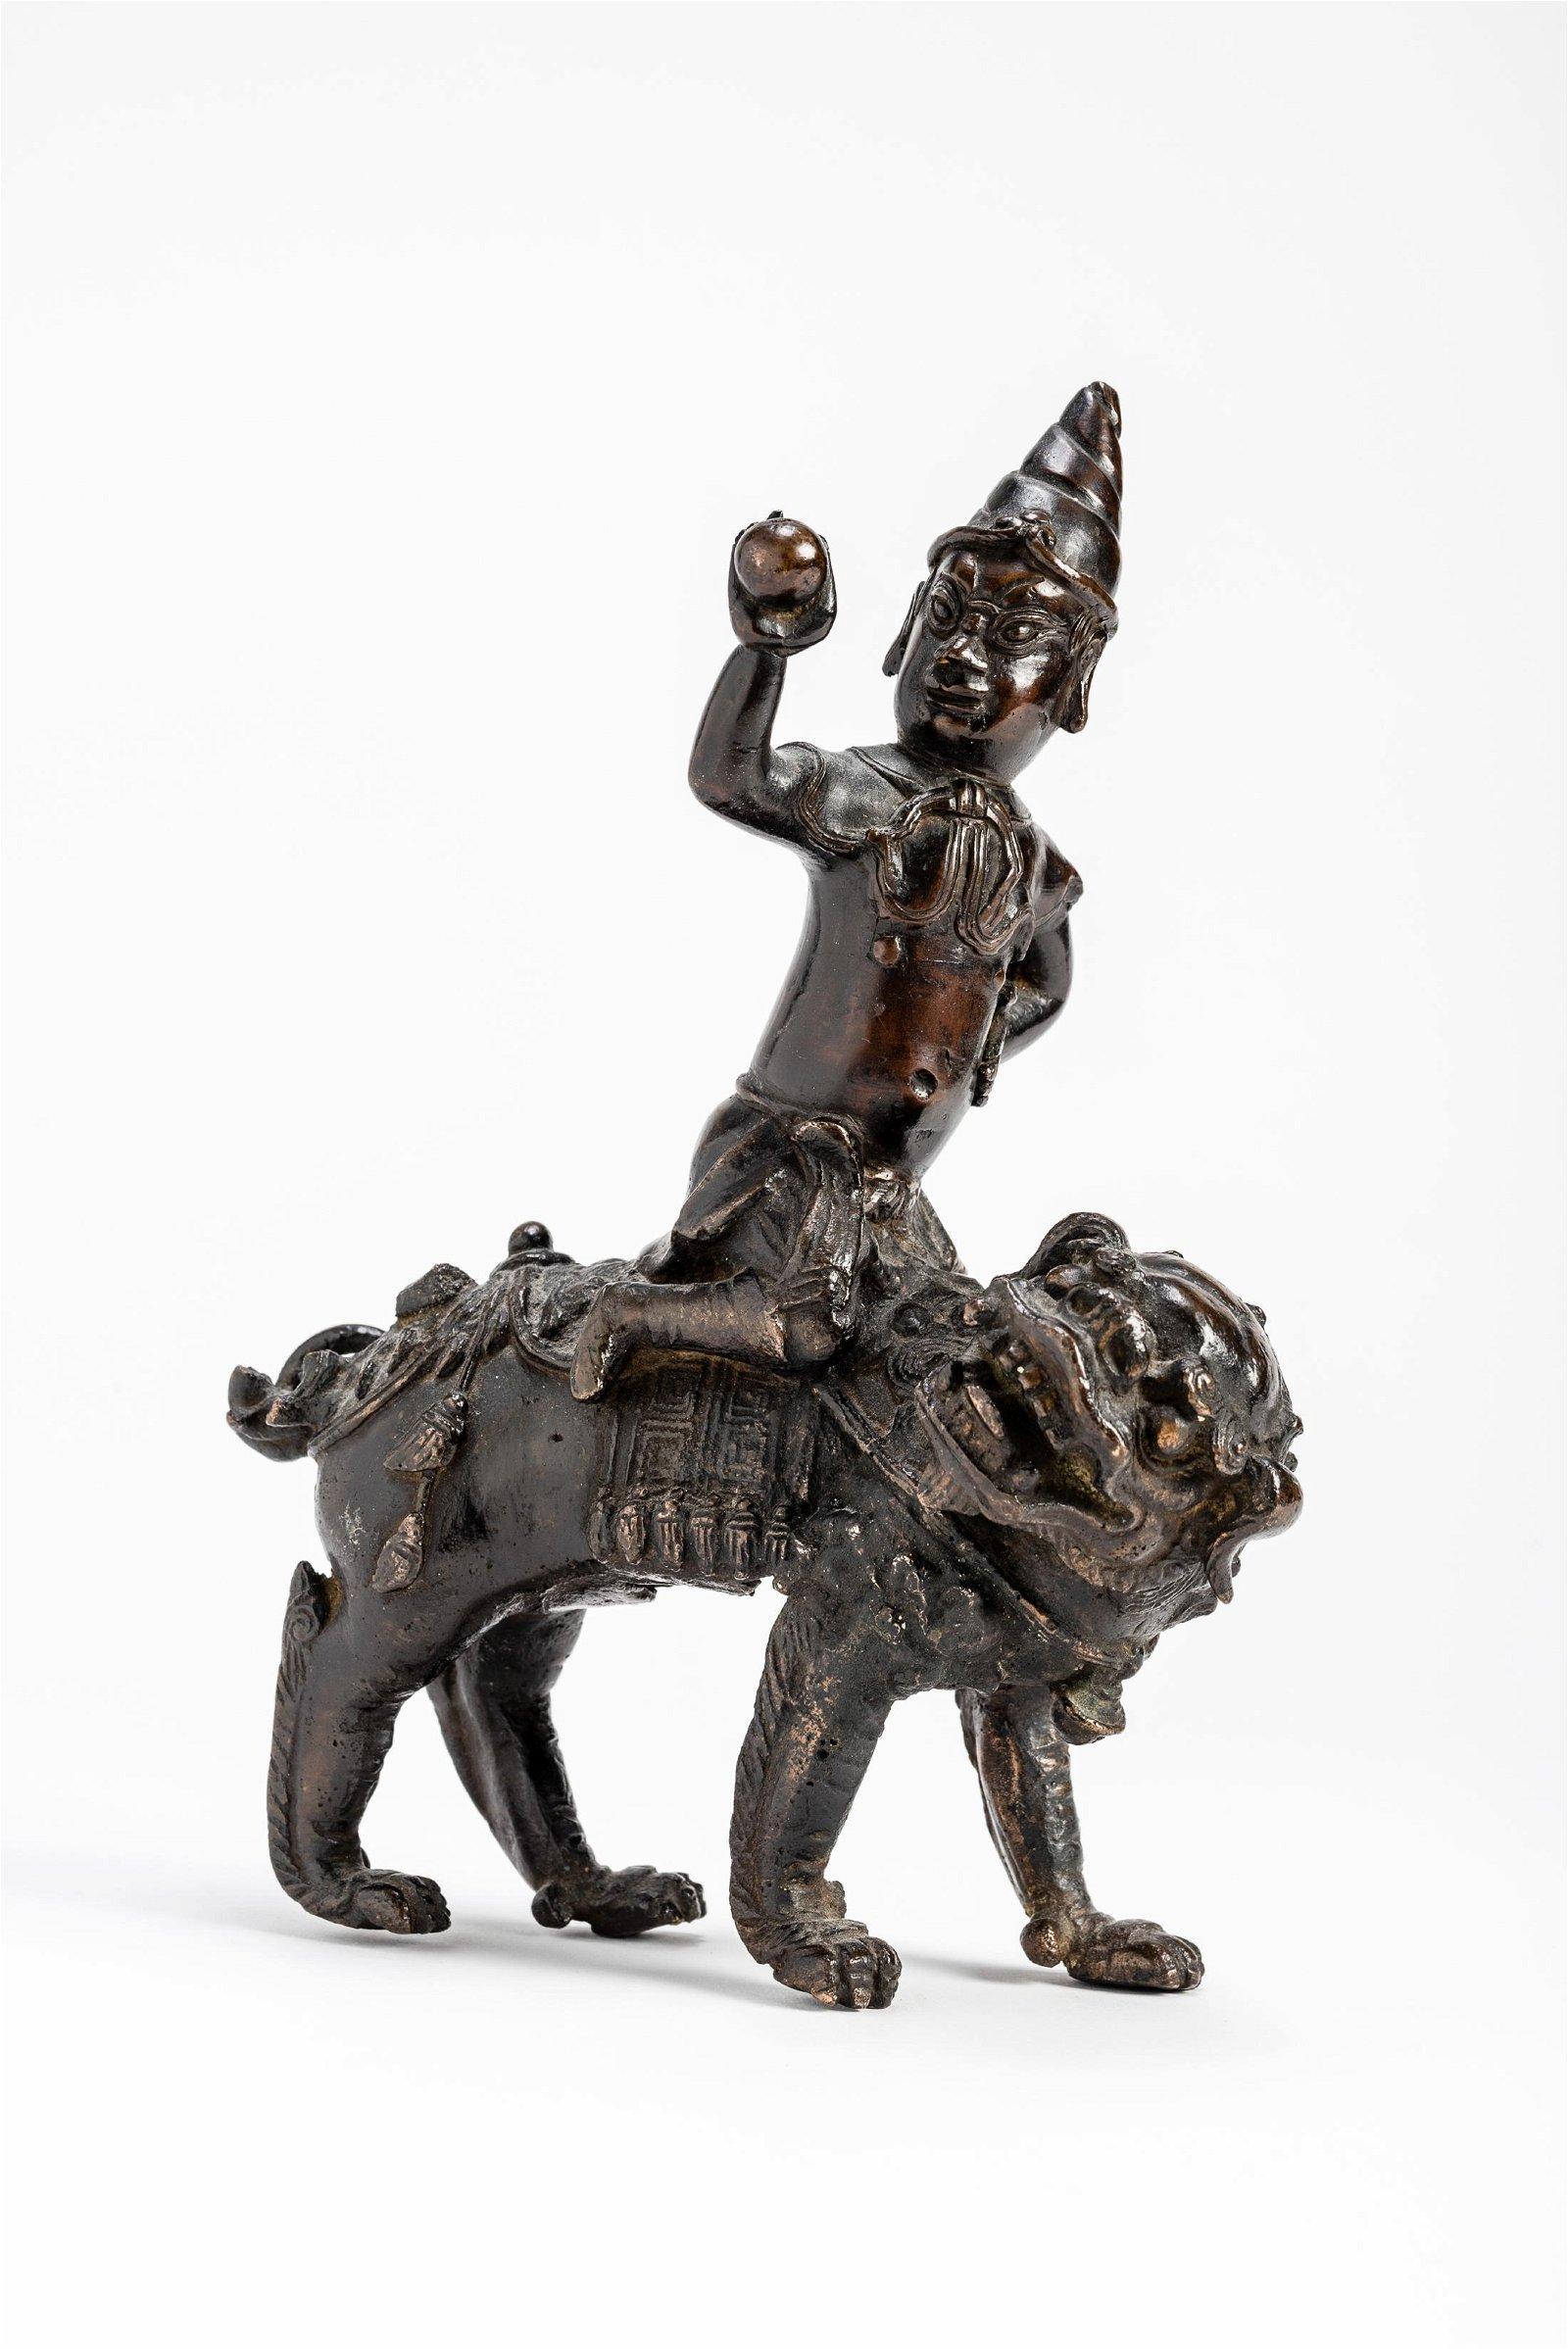 A BRONZE GUARDIAN DEITY RIDING ON A LION